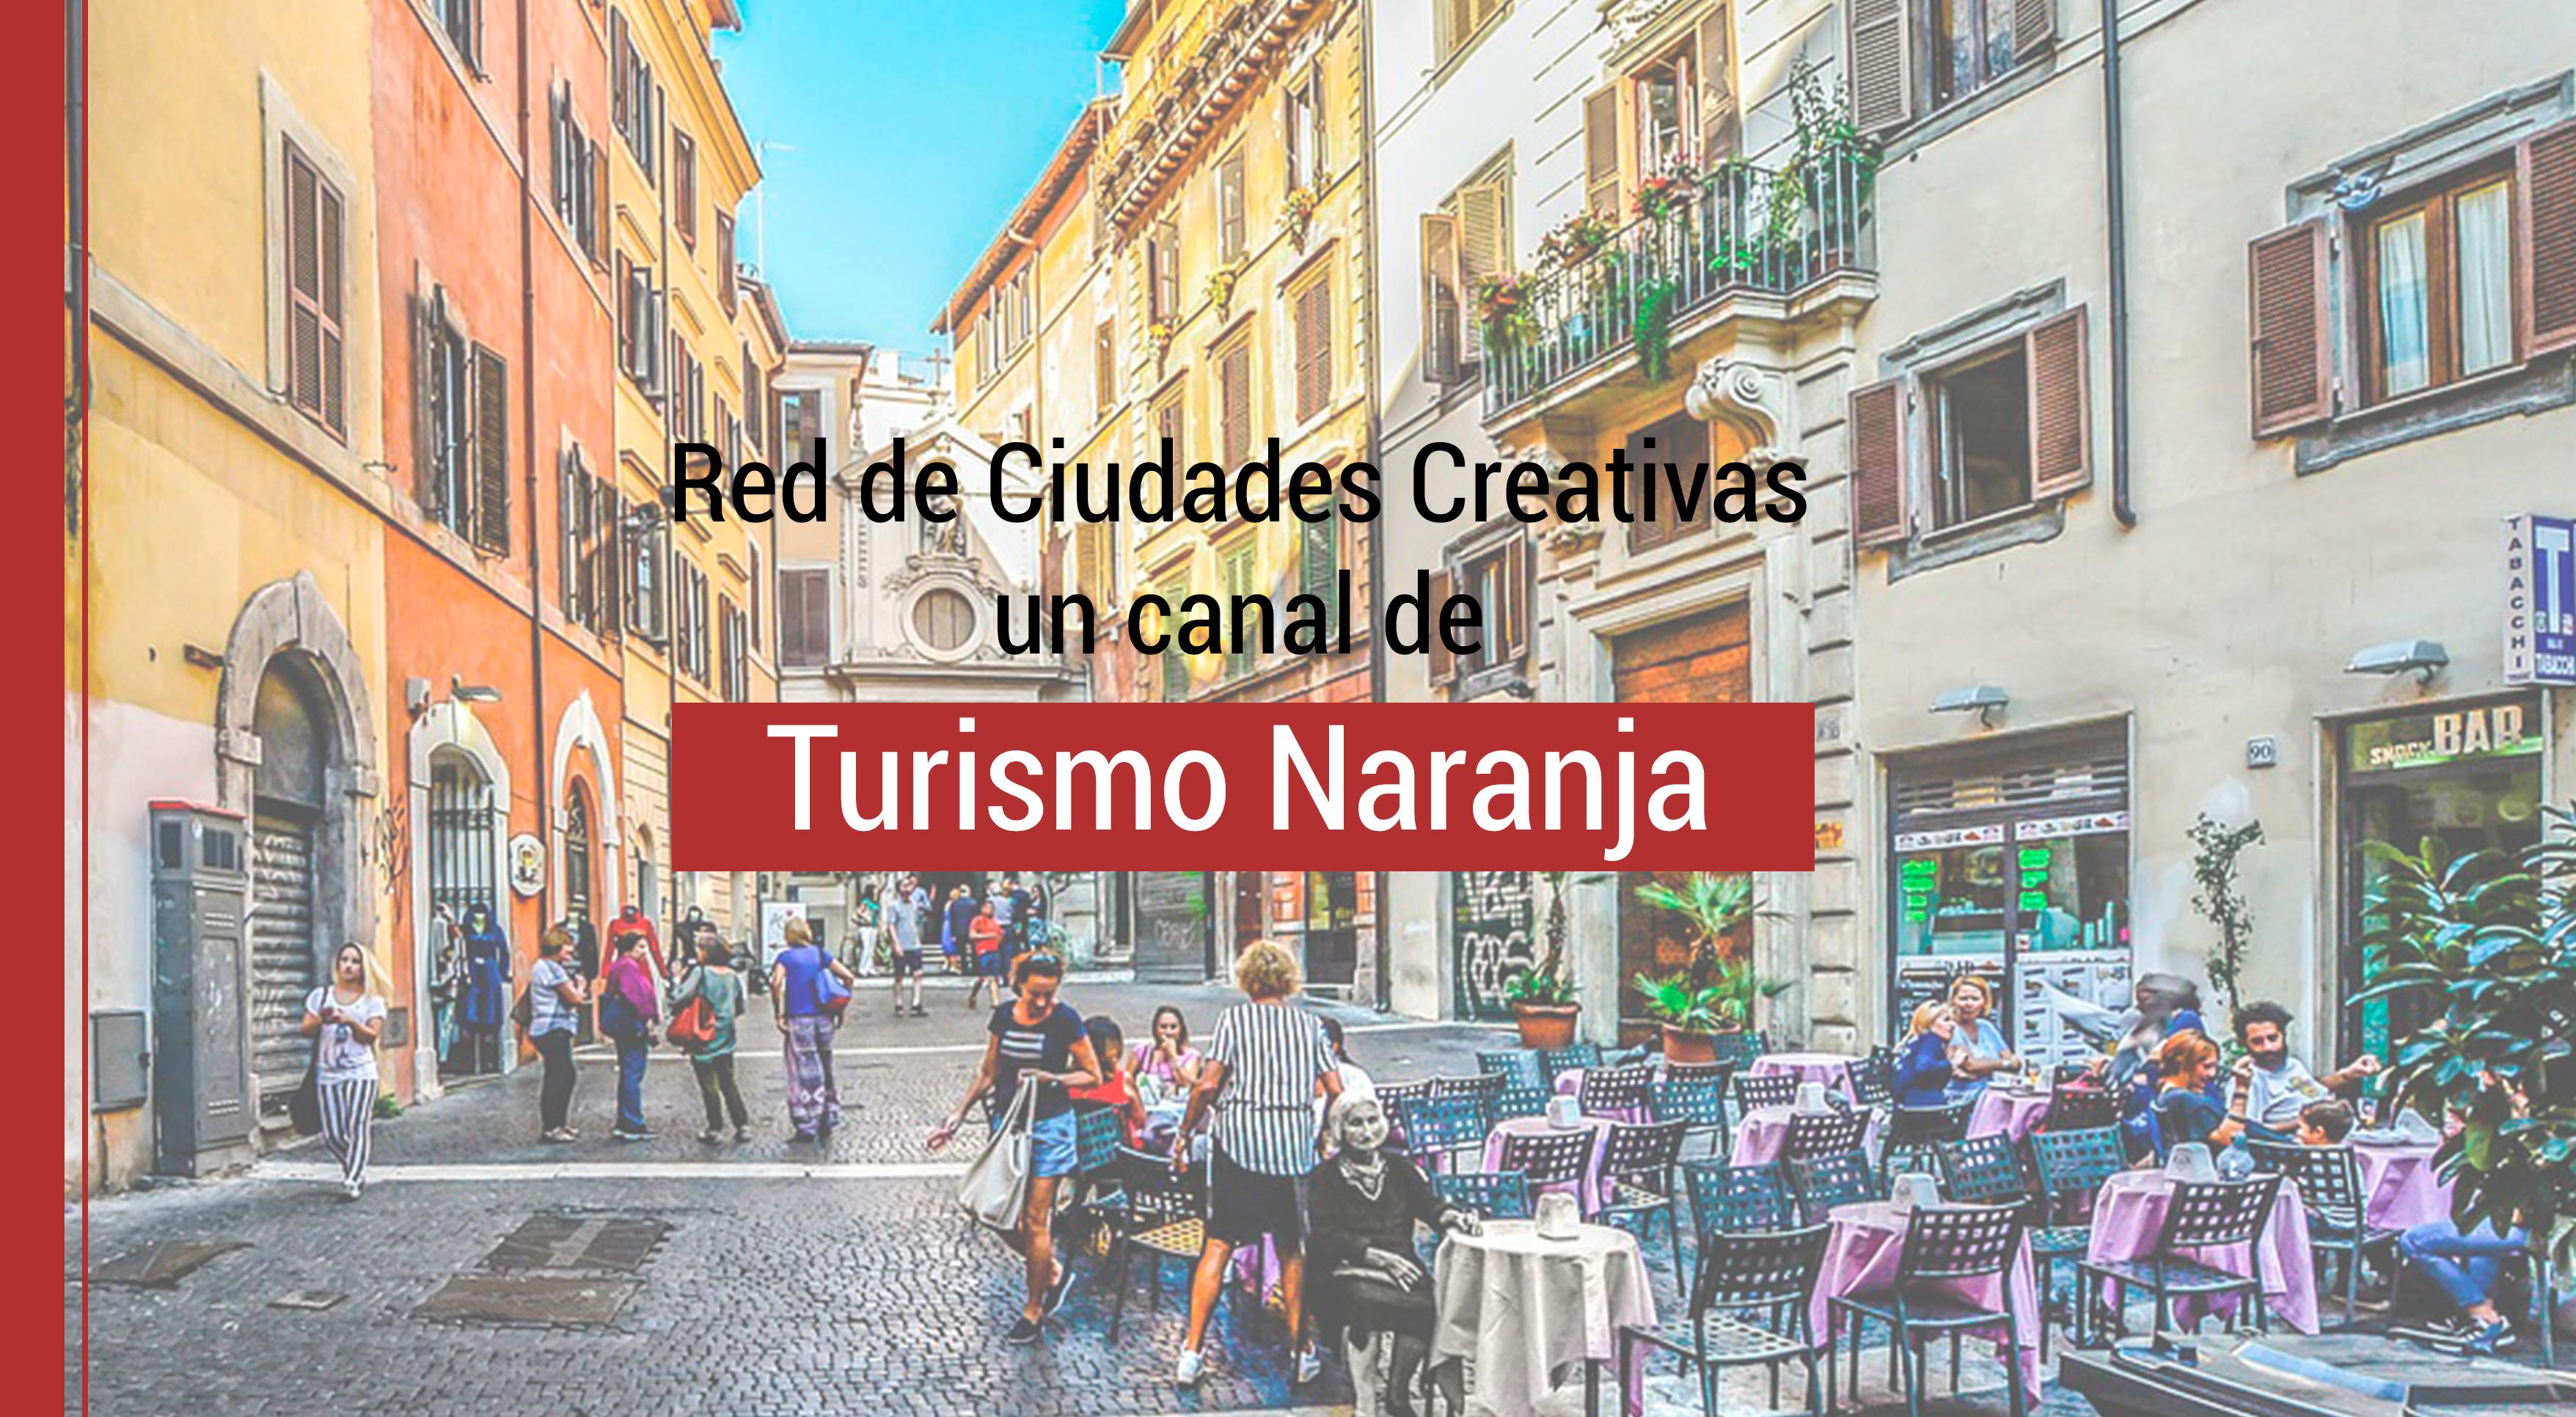 ciudades-creativas-turismo-naranja Red de Ciudades Creativas un canal de Turismo Naranja